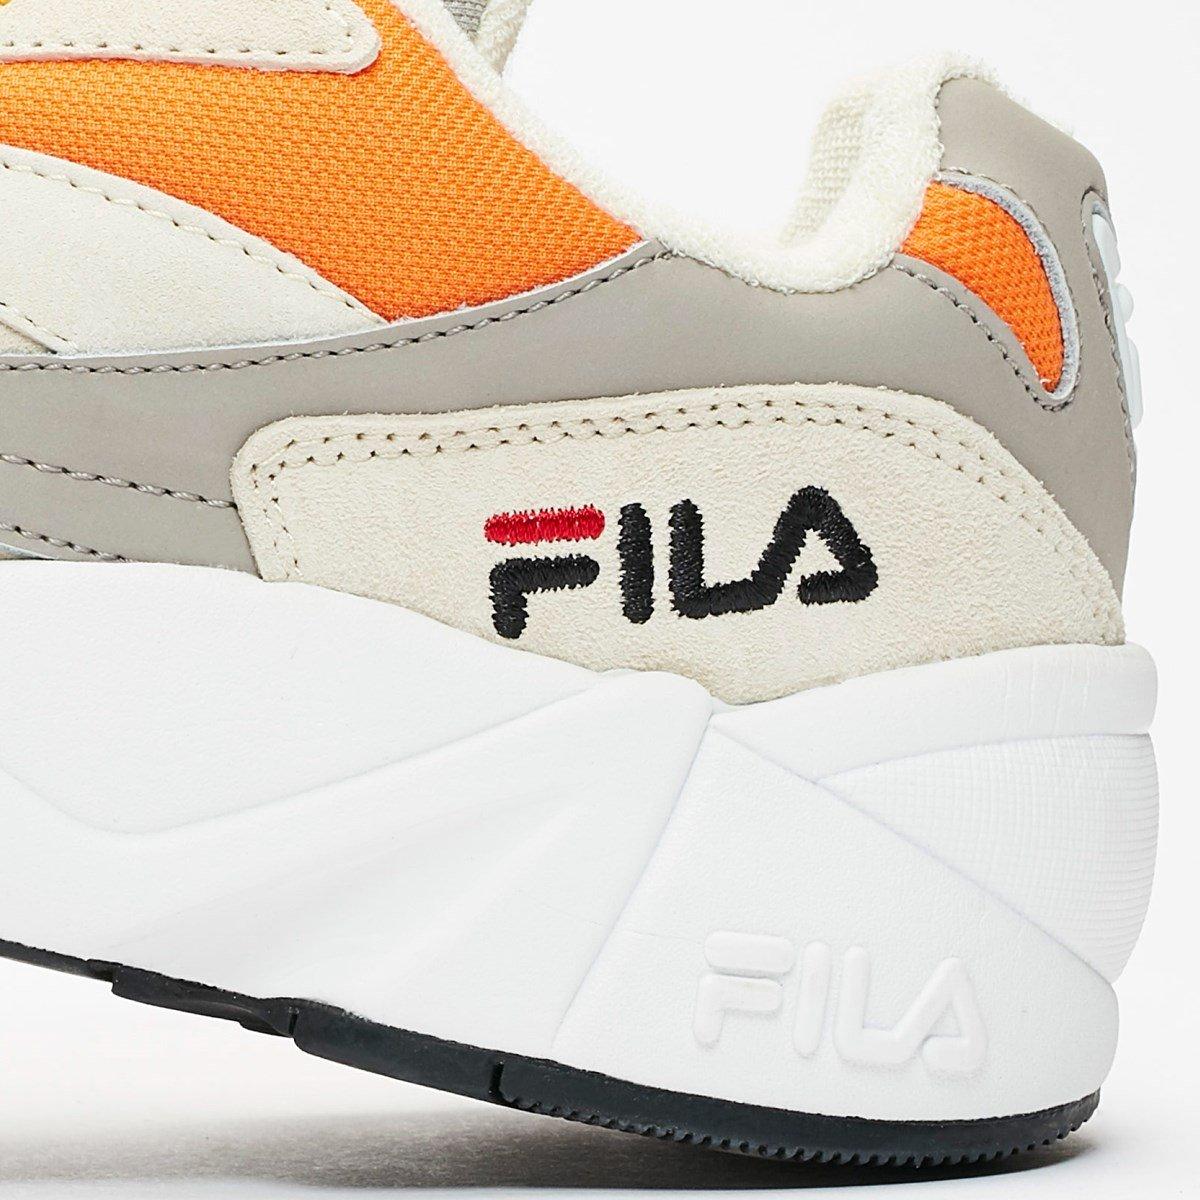 Fila FILA 94 WMN - 1010670-12d